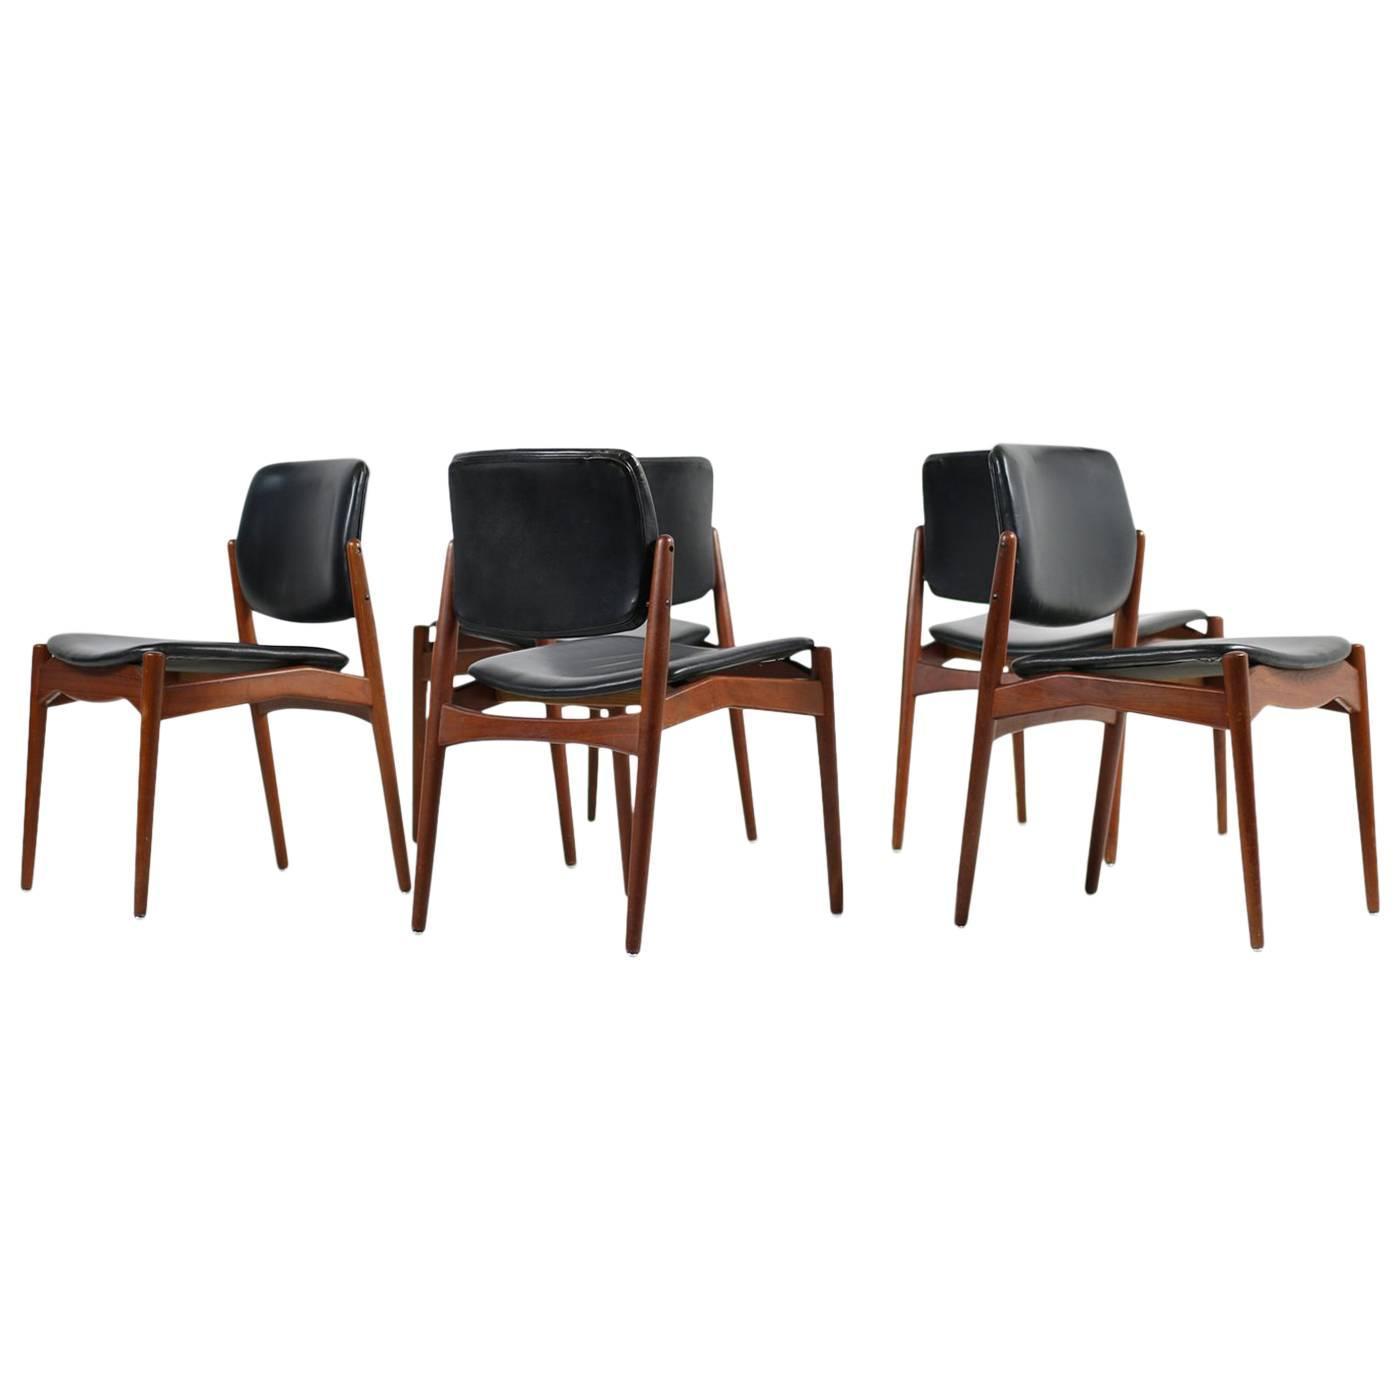 Rosewood and Teak Set of Six Erik Buck Model 310 Dining Chairs